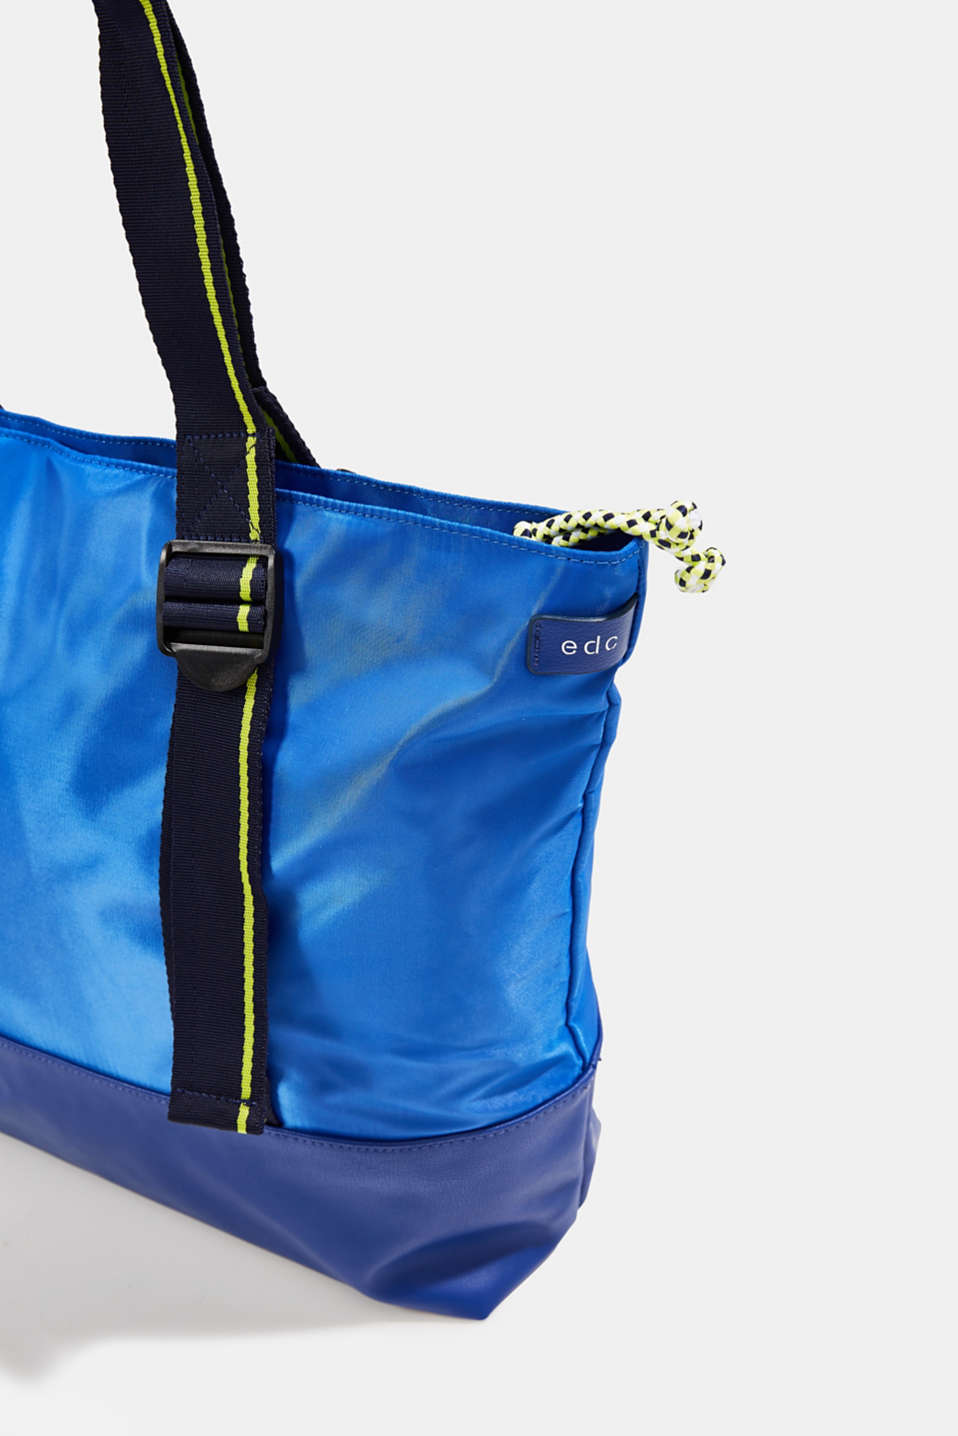 Nylon tote bag, BRIGHT BLUE, detail image number 3